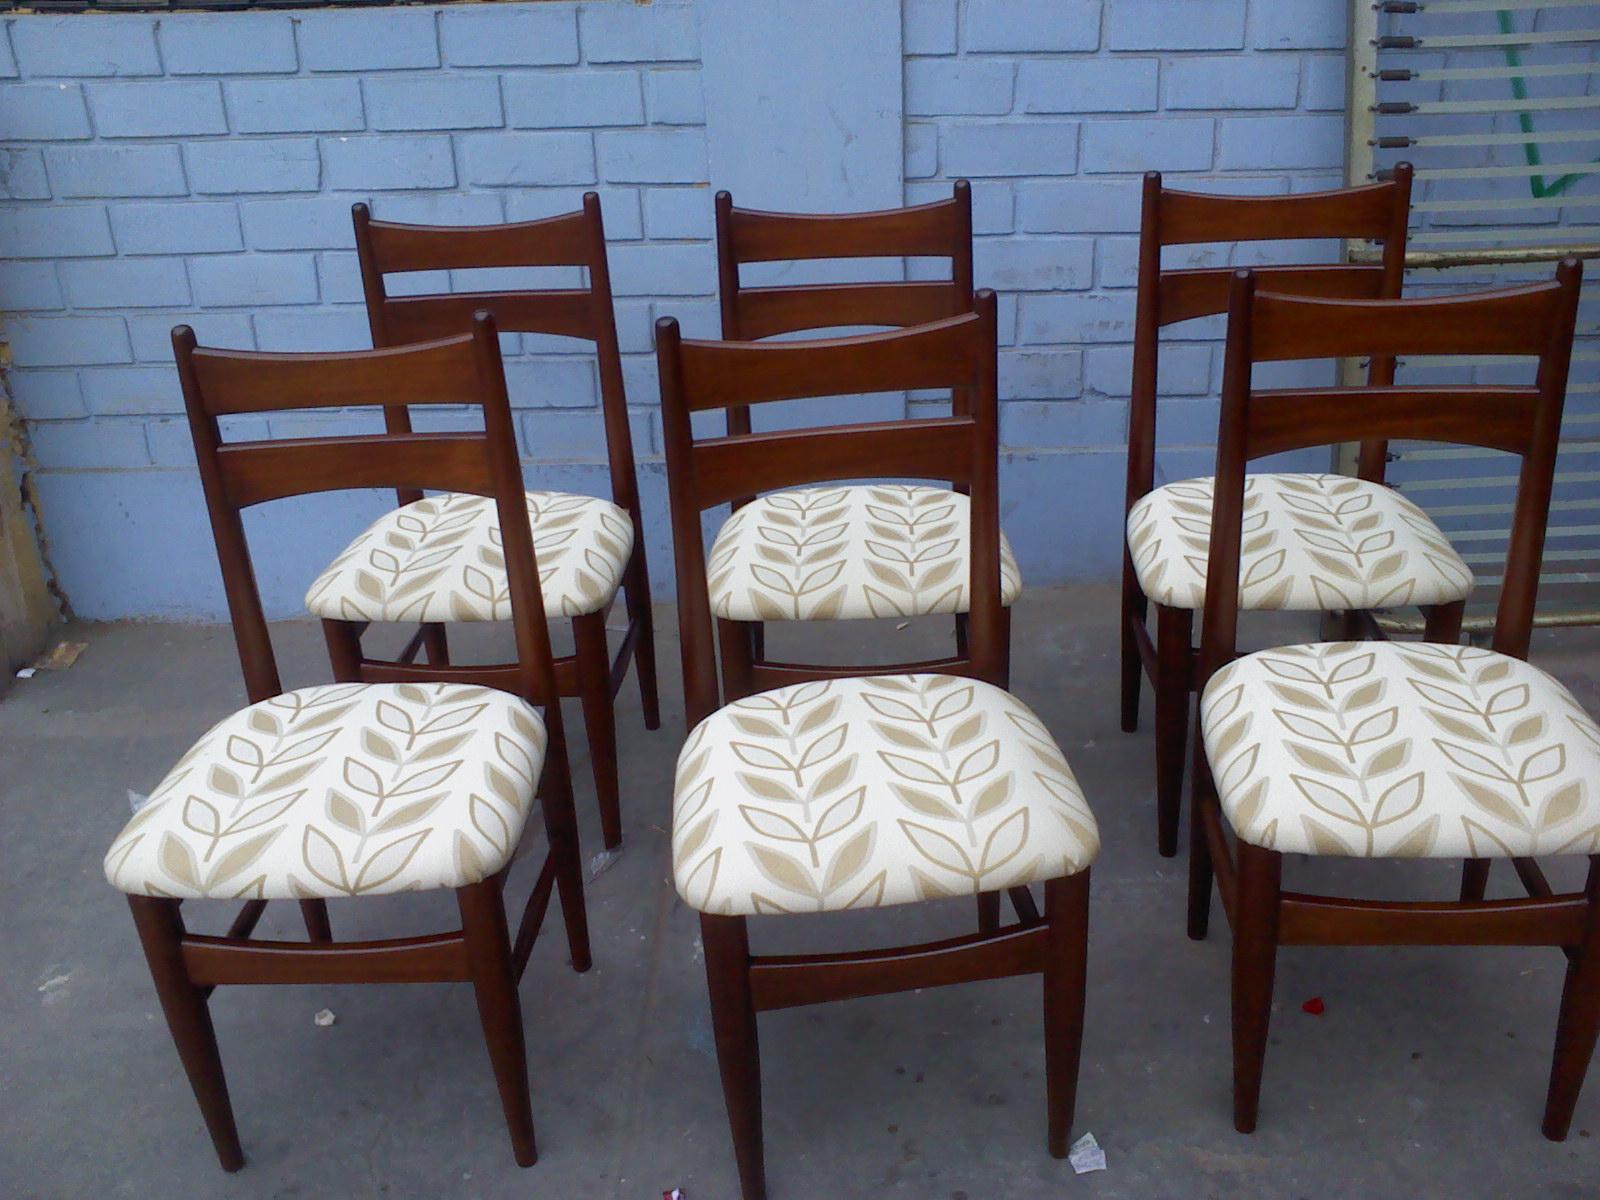 Tapicer a c ndor sillas de madera - Tapiceria de sillas precios ...